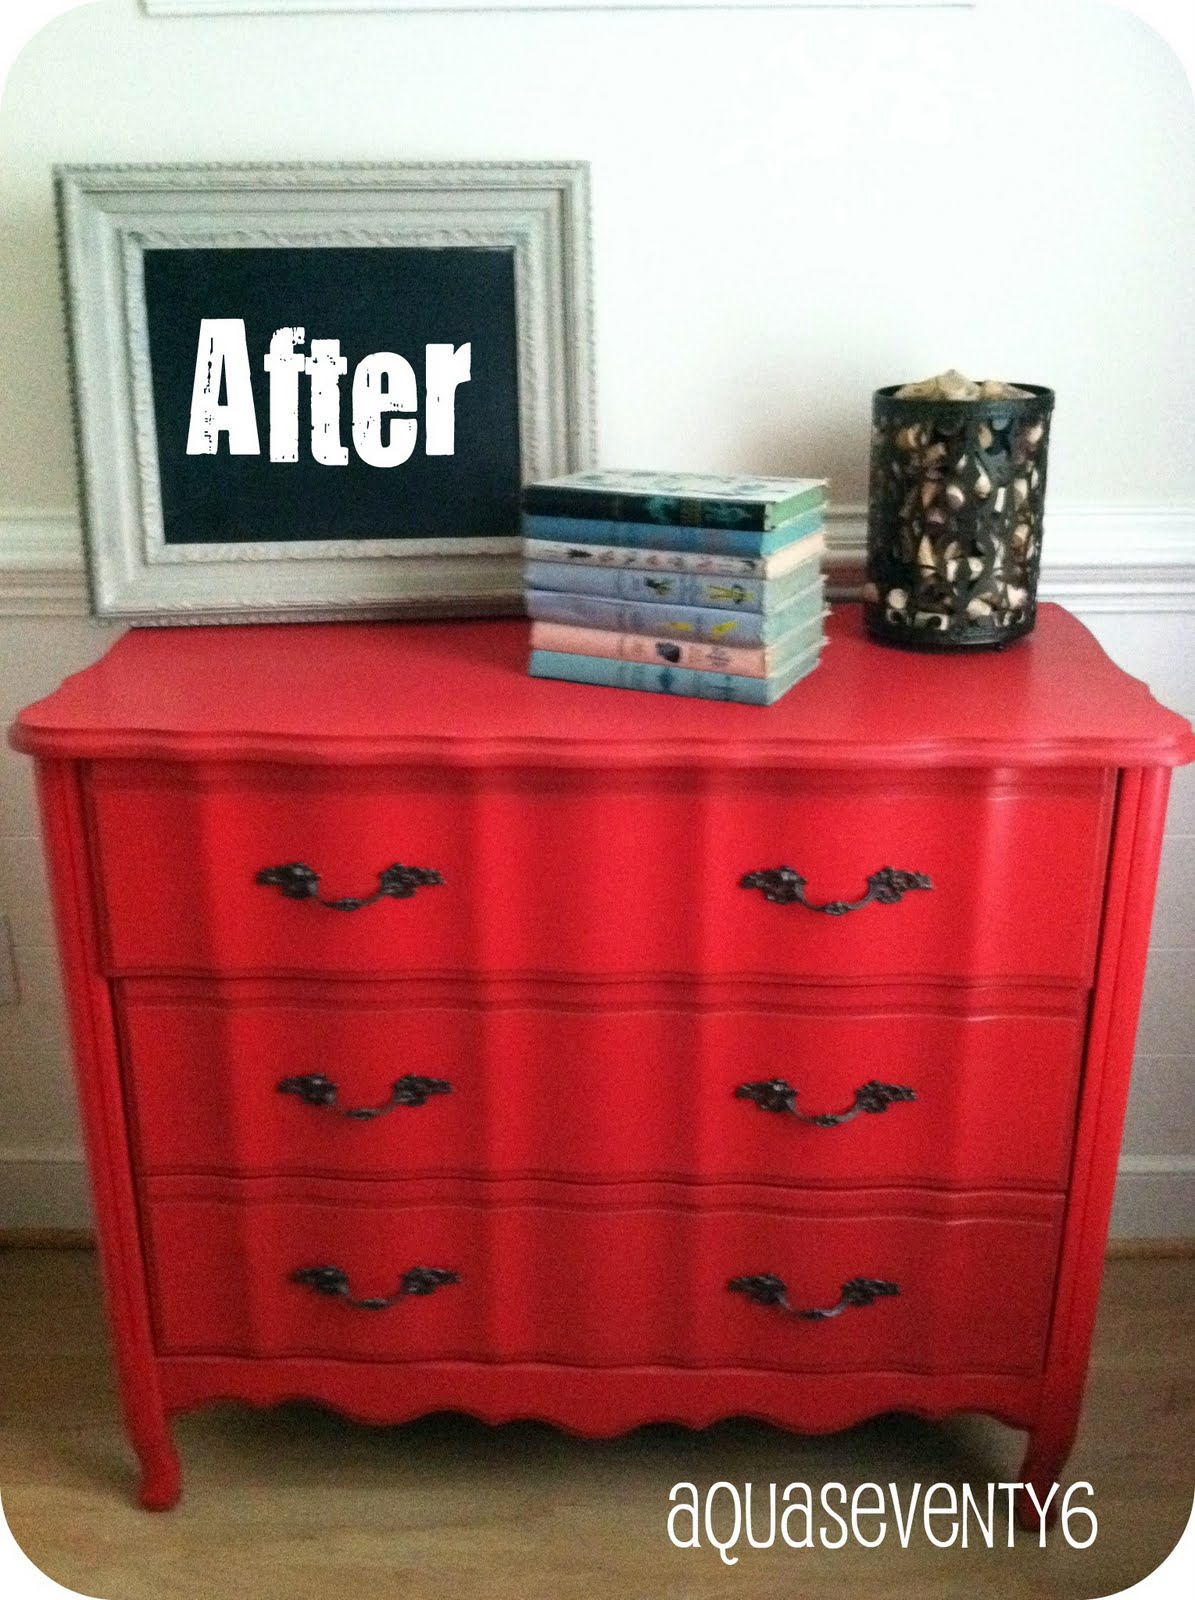 Aqua Seventy6 Oldie But A Goodie Red Dresser